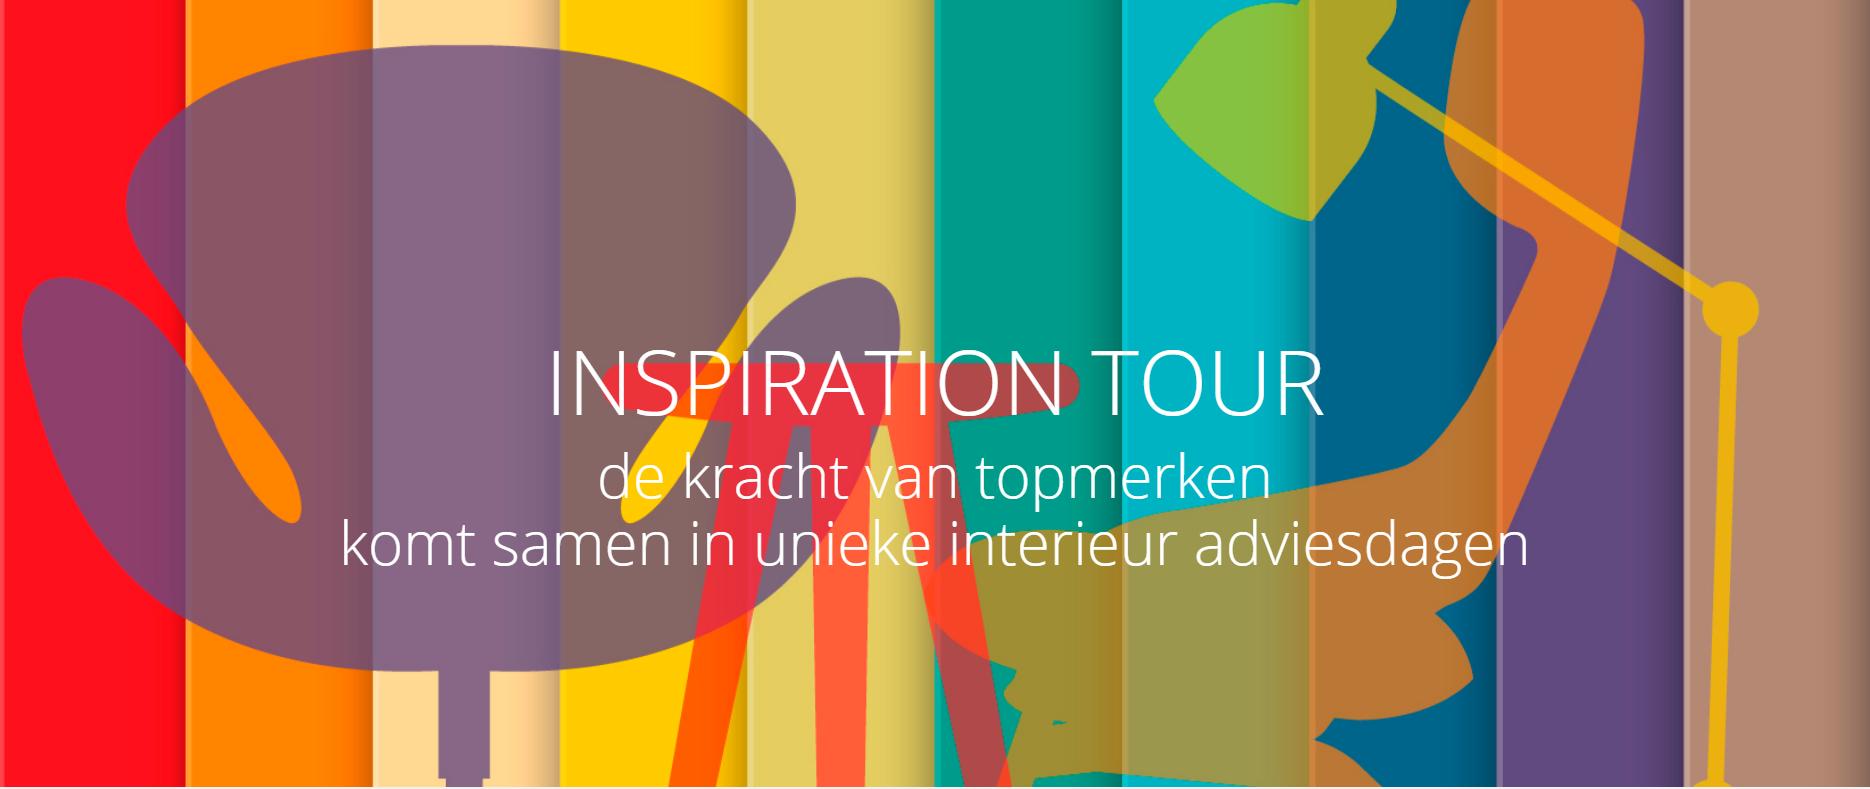 https://www.kooijmaninterieurs.nl/klikproces/wp-content/uploads/2018/05/banner.png